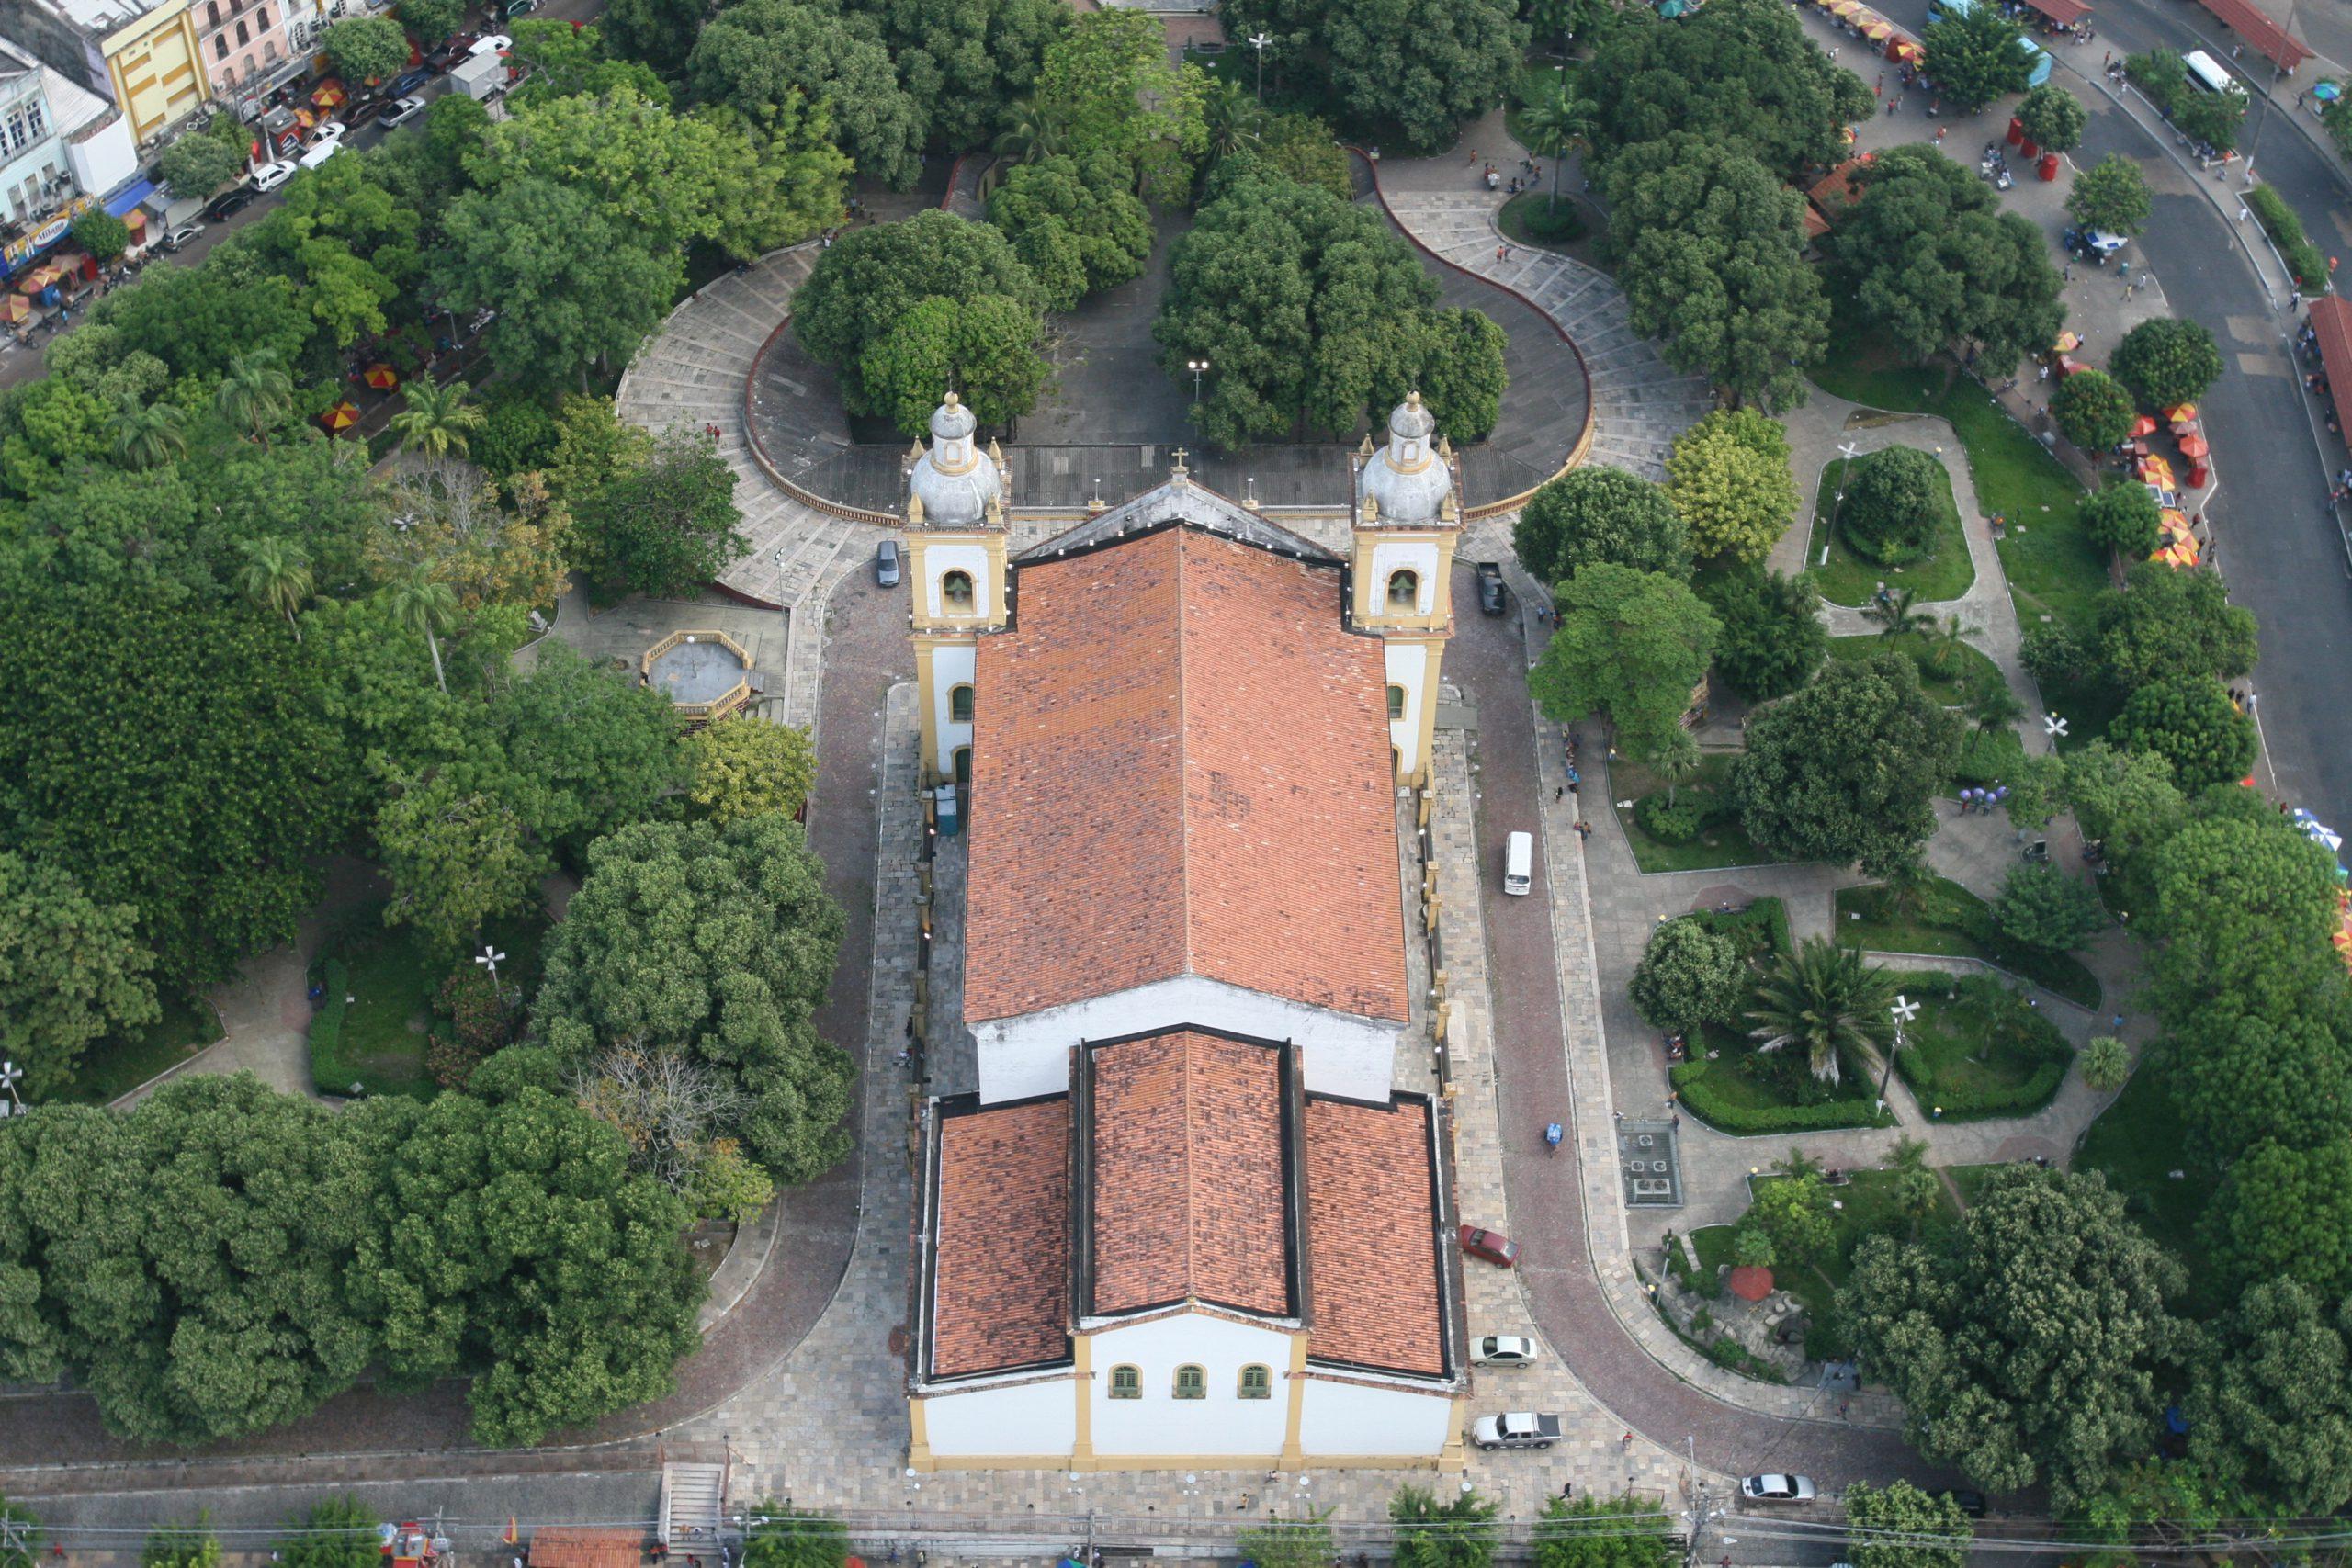 Vista aérea da Igreja Matriz de Manaus - Instituto Durango Duarte 2007